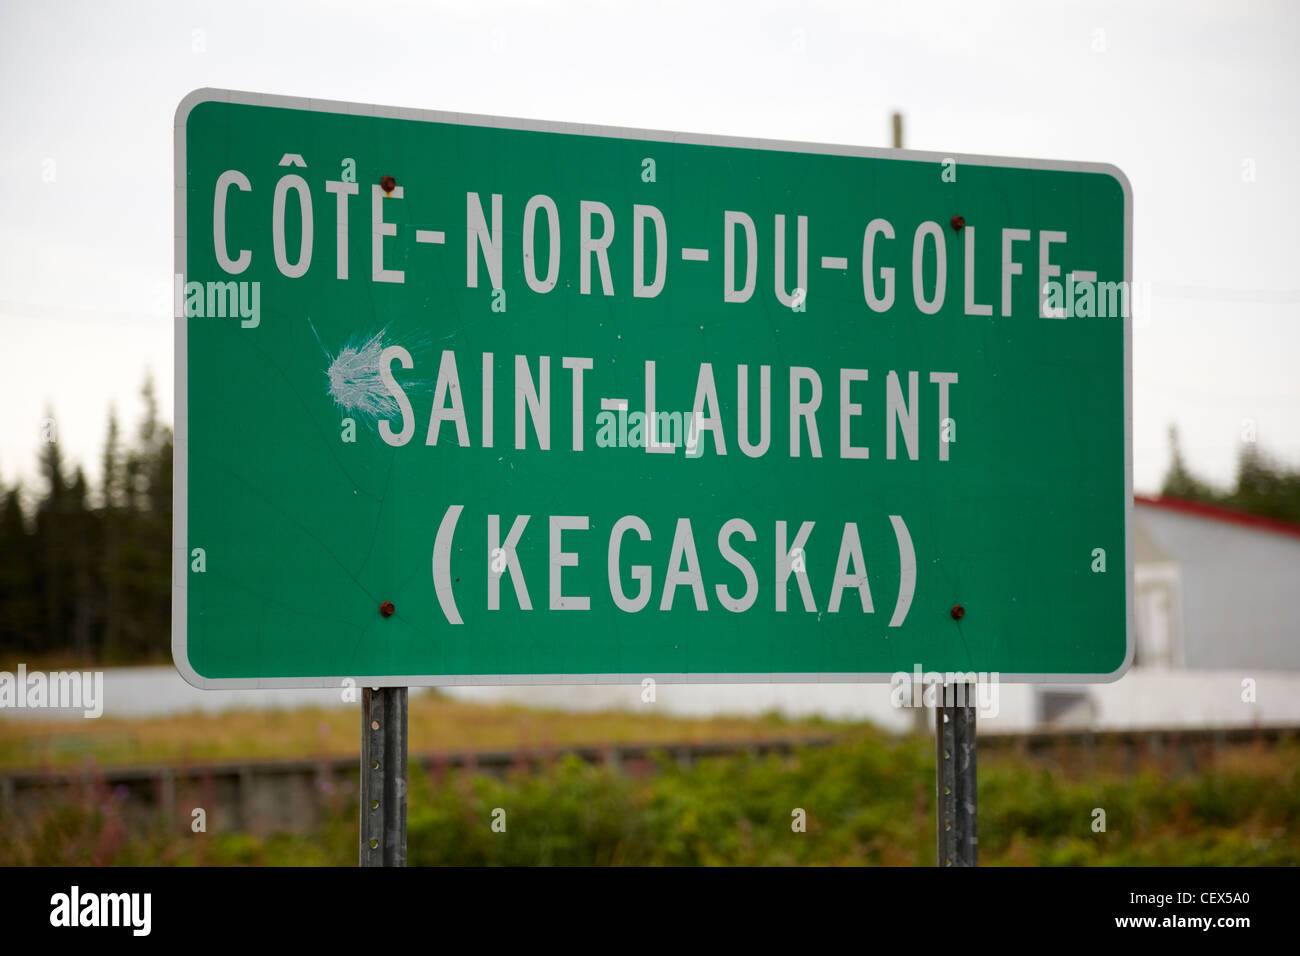 Cote-Nord-Du-Golfe-Saint-Laurent, Kegaska Straßenschild, Quebec, Kanada Stockbild